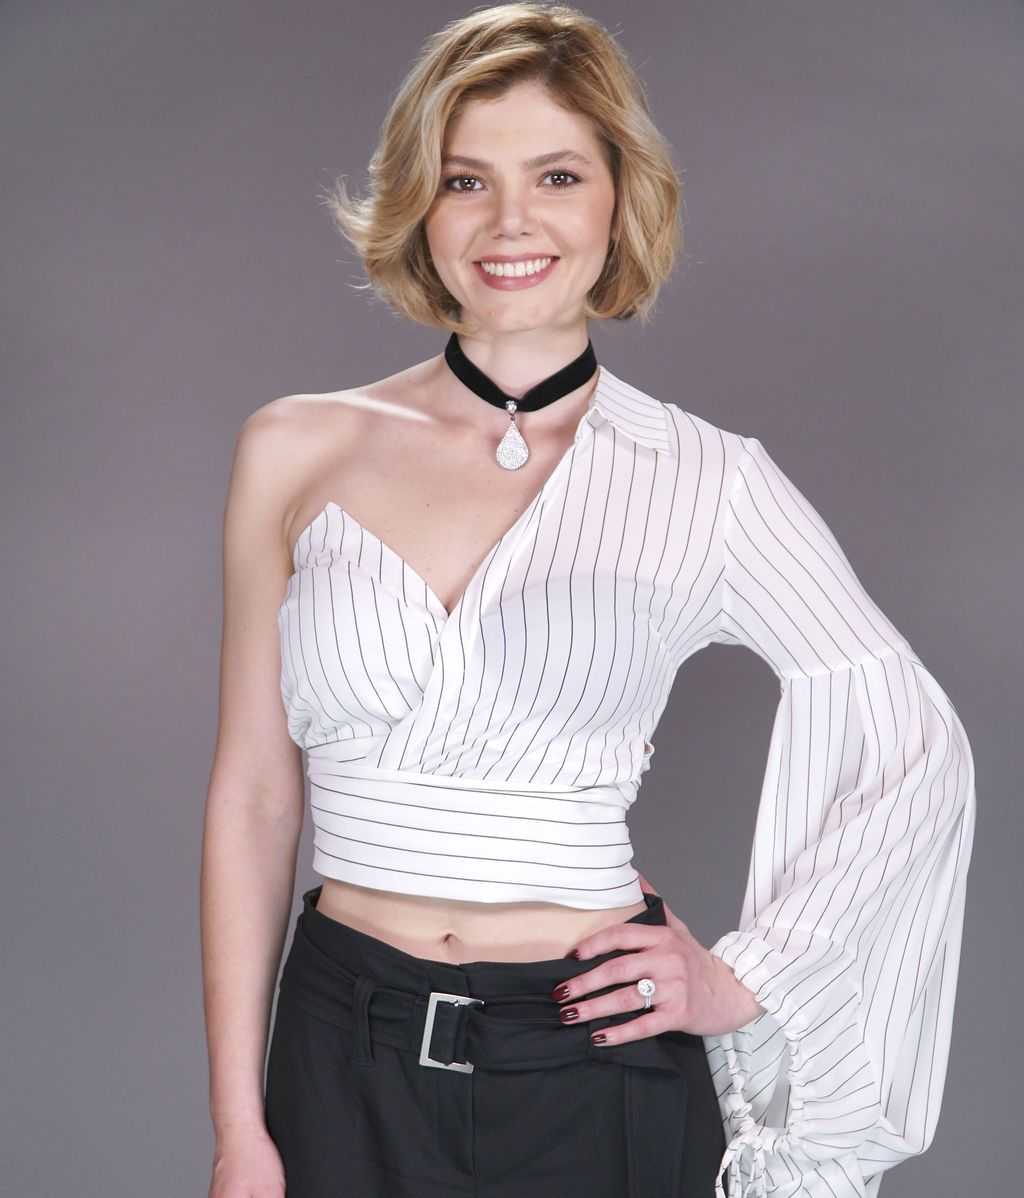 Aliona Bozbey